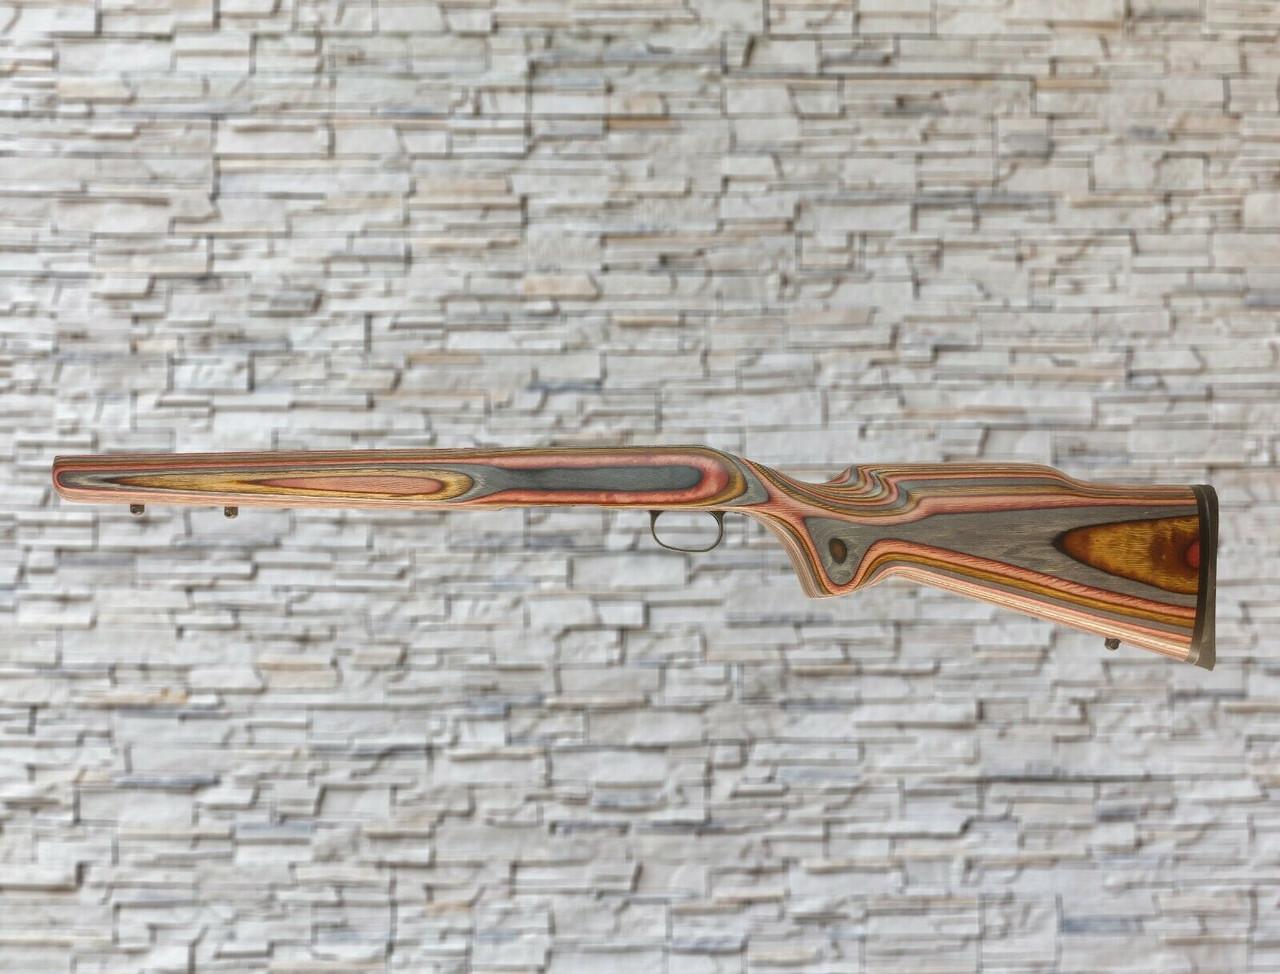 Boyds Rimfire Hunter Wood Stock Royal Jacranda for Ruger American Rimfire 22LR Rifles